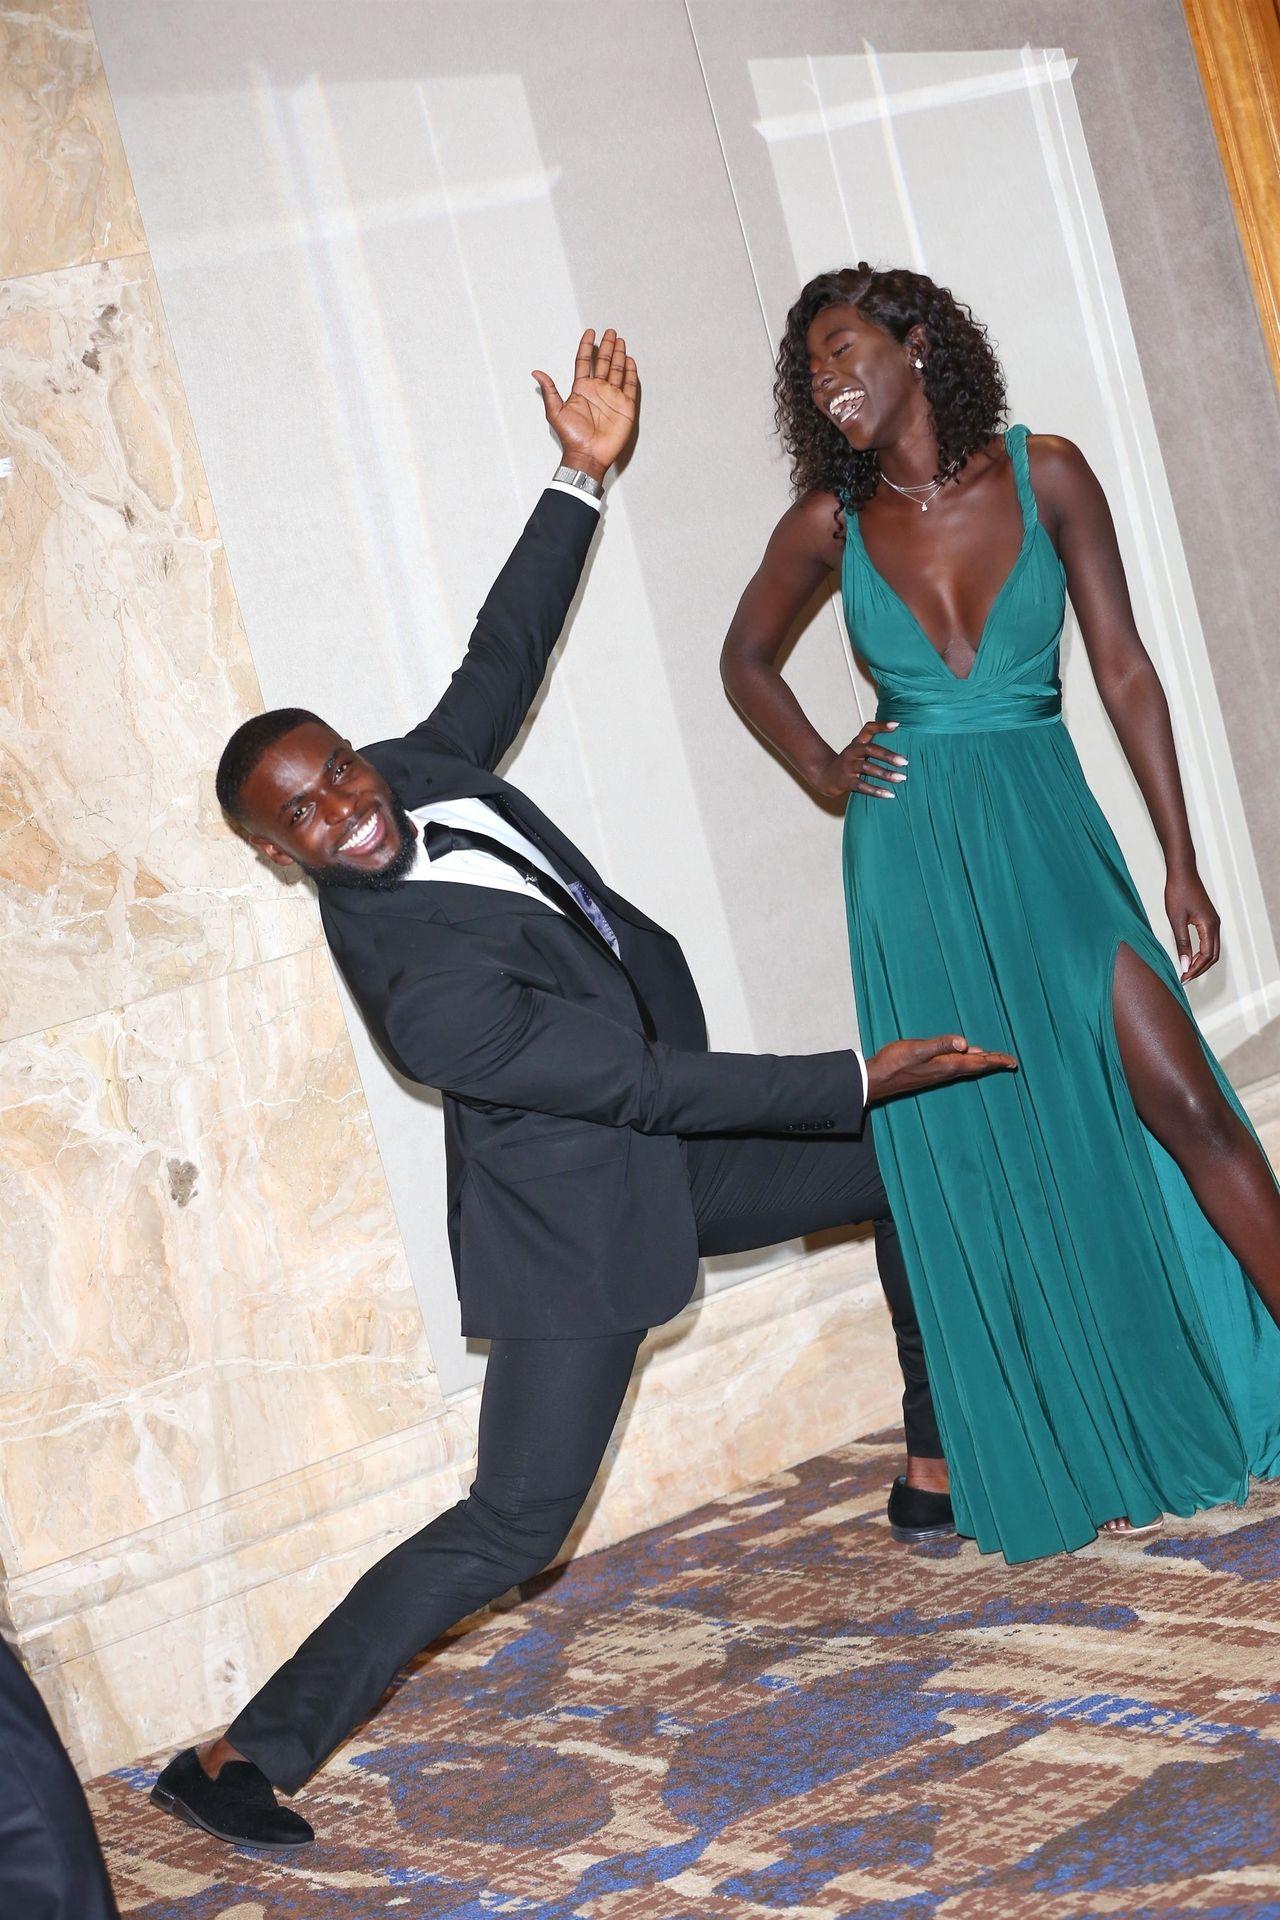 Mike Boateng & Priscilla Anyabu Are Seen At British Ethnic Diversity Sports Awards 0144